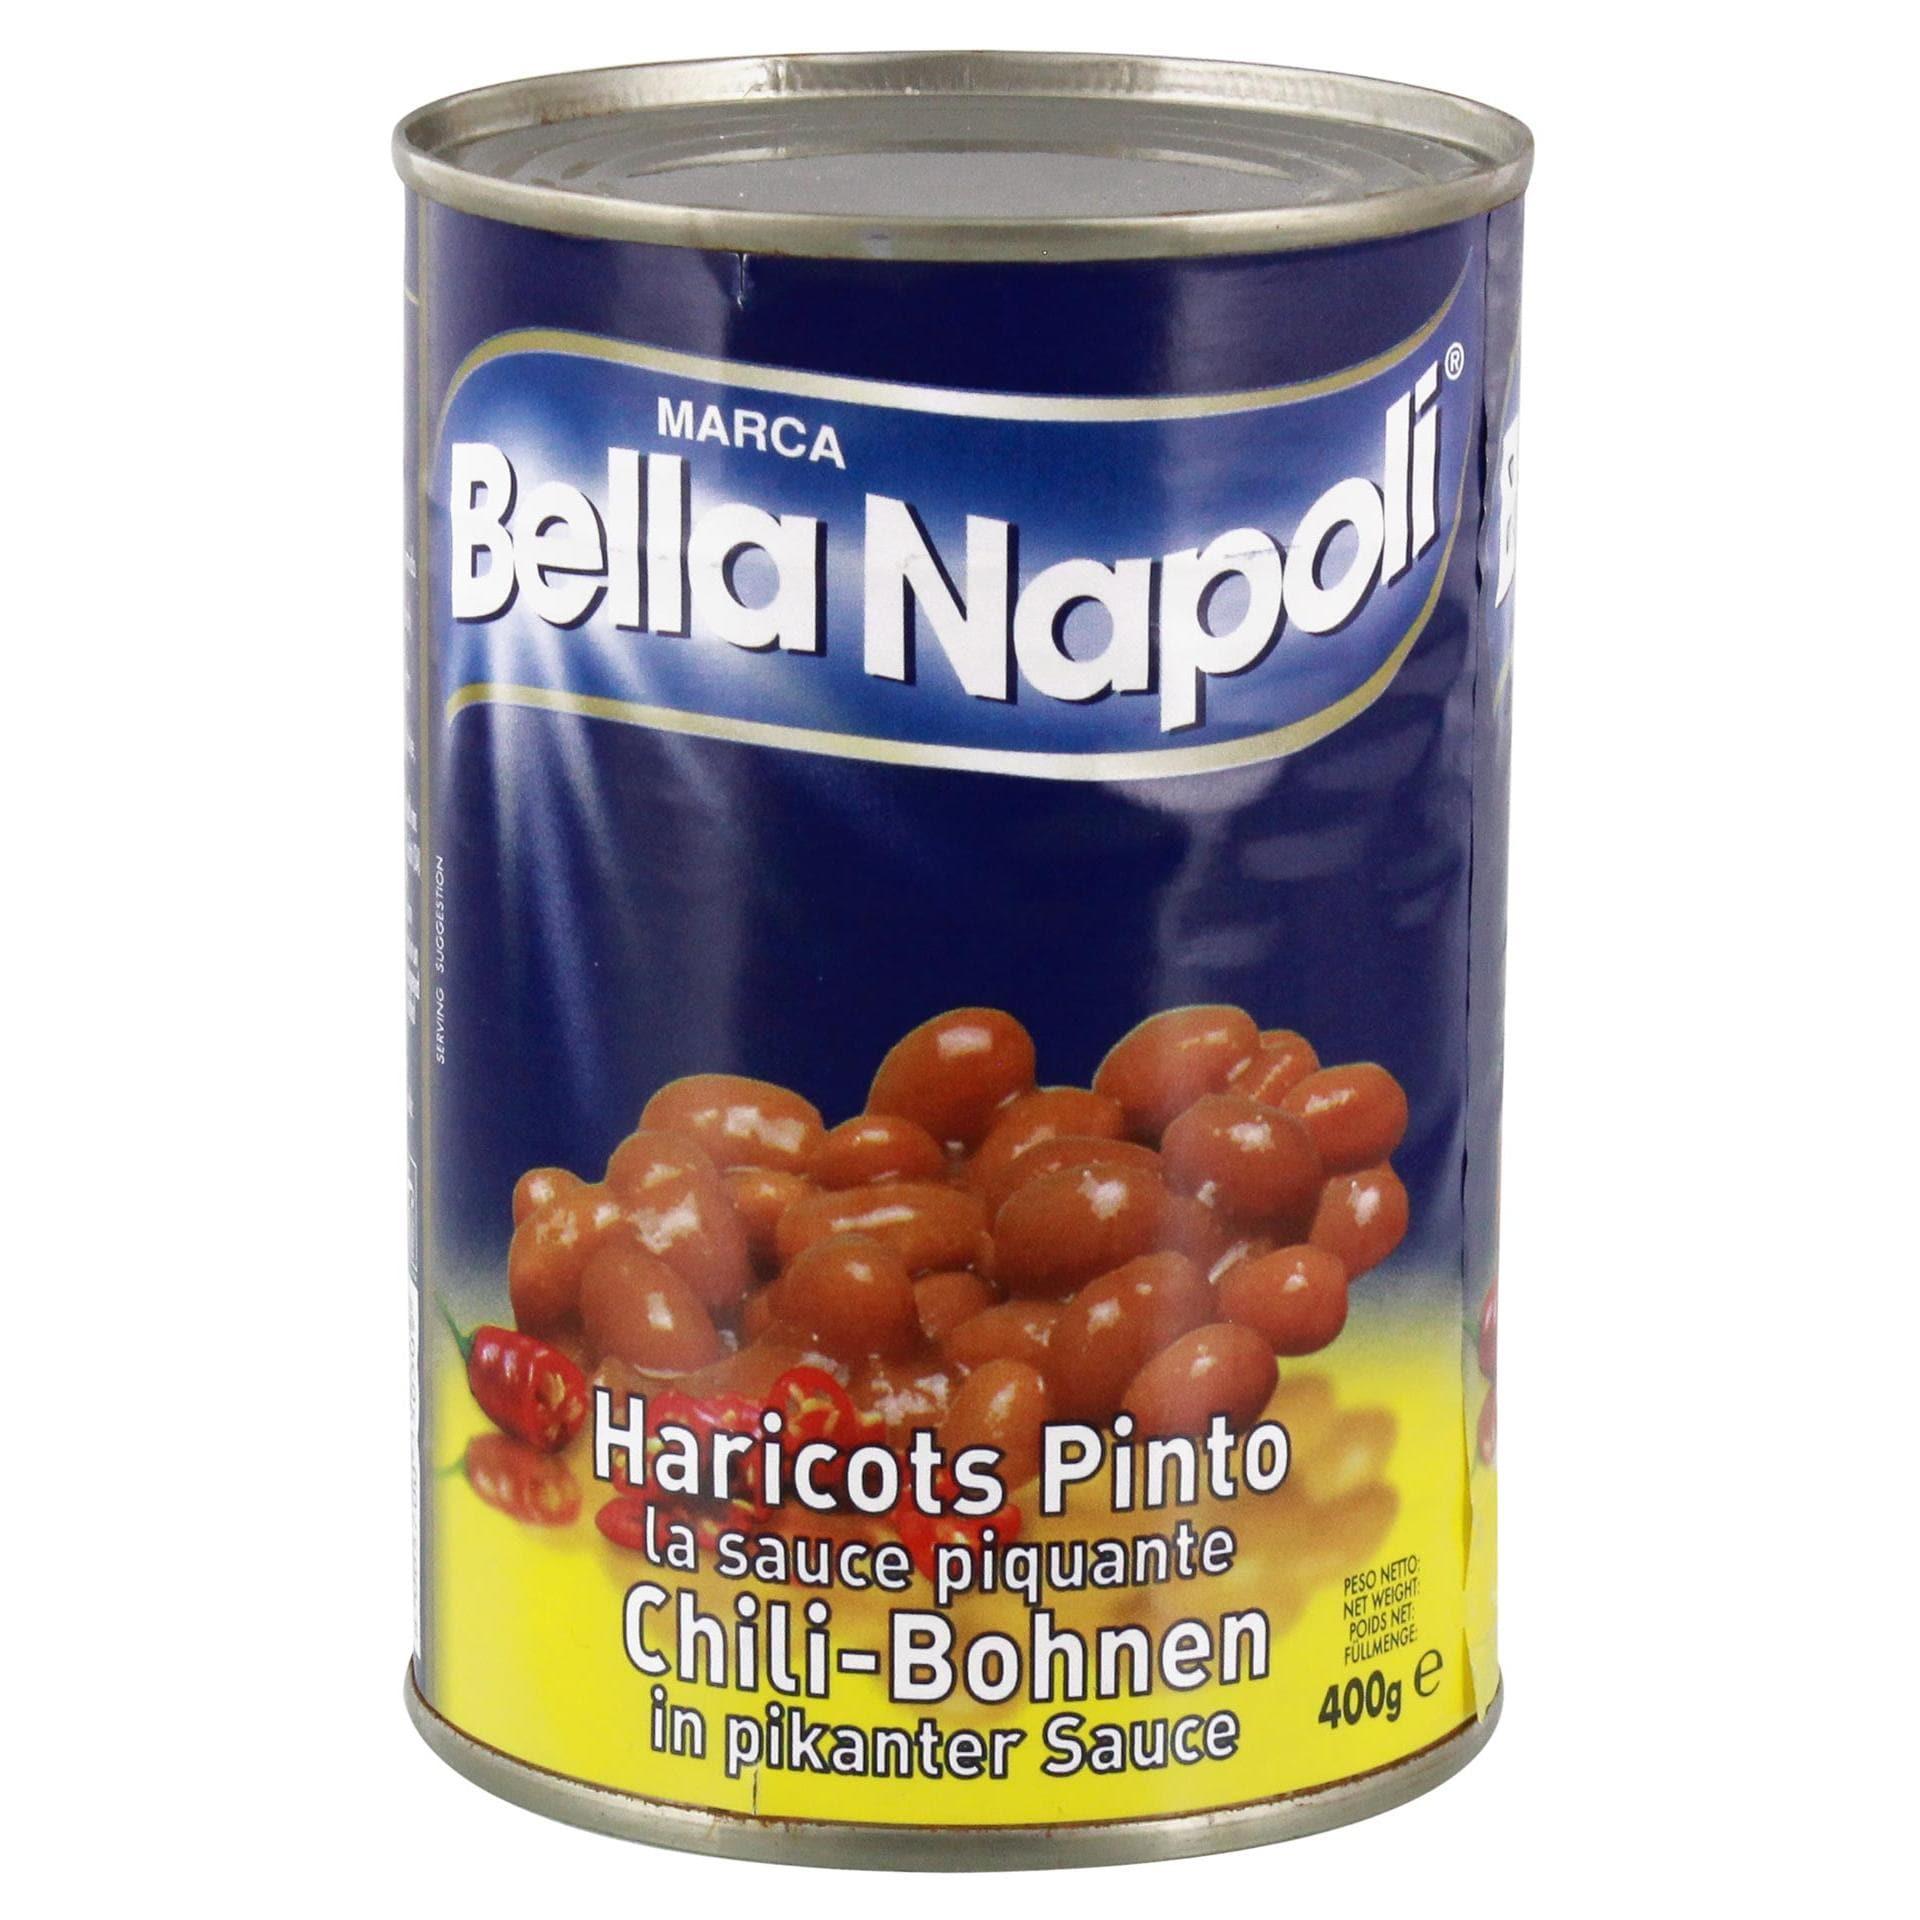 Rio Bravo Chili-Bohnen in pikanter Sauce 400g